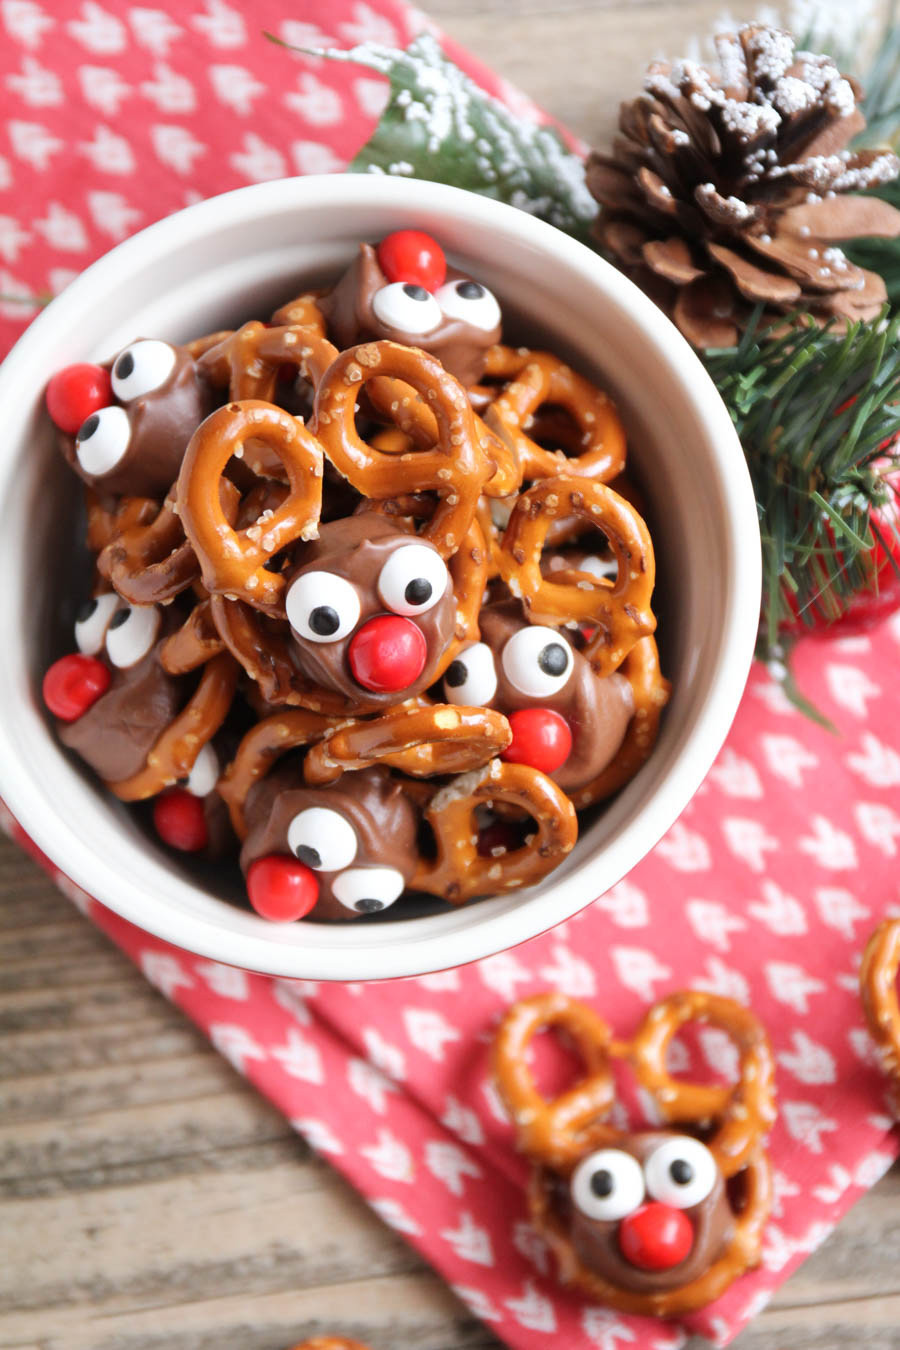 Christmas Candy Treats  25 Fun Christmas Treat Ideas – Fun Squared